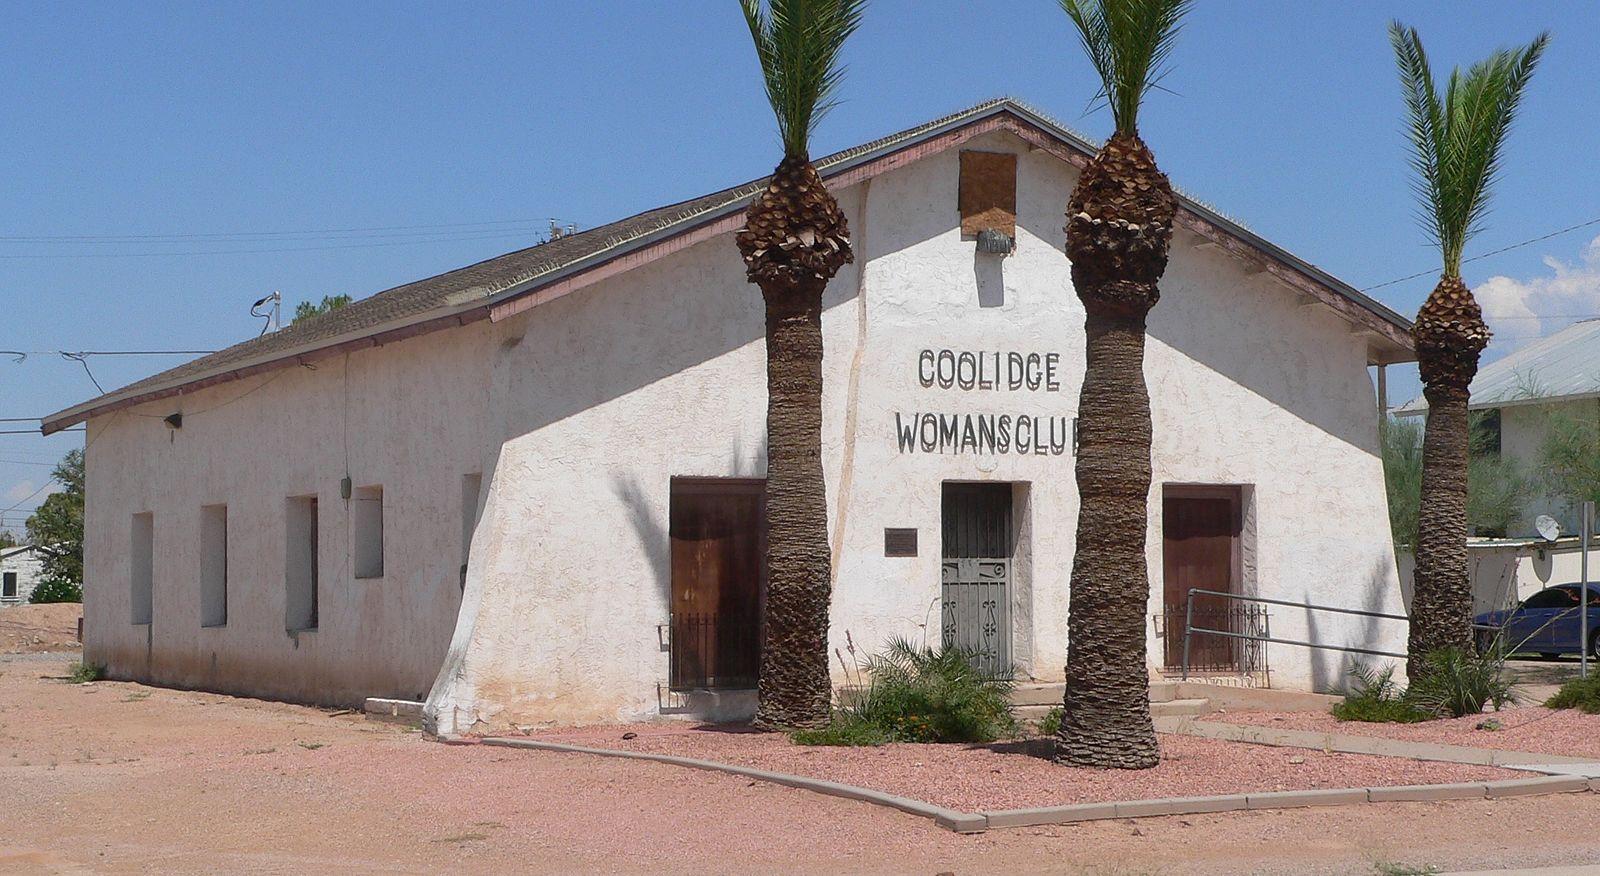 Coolidge_Womans_Club_(Arizona)_(4)